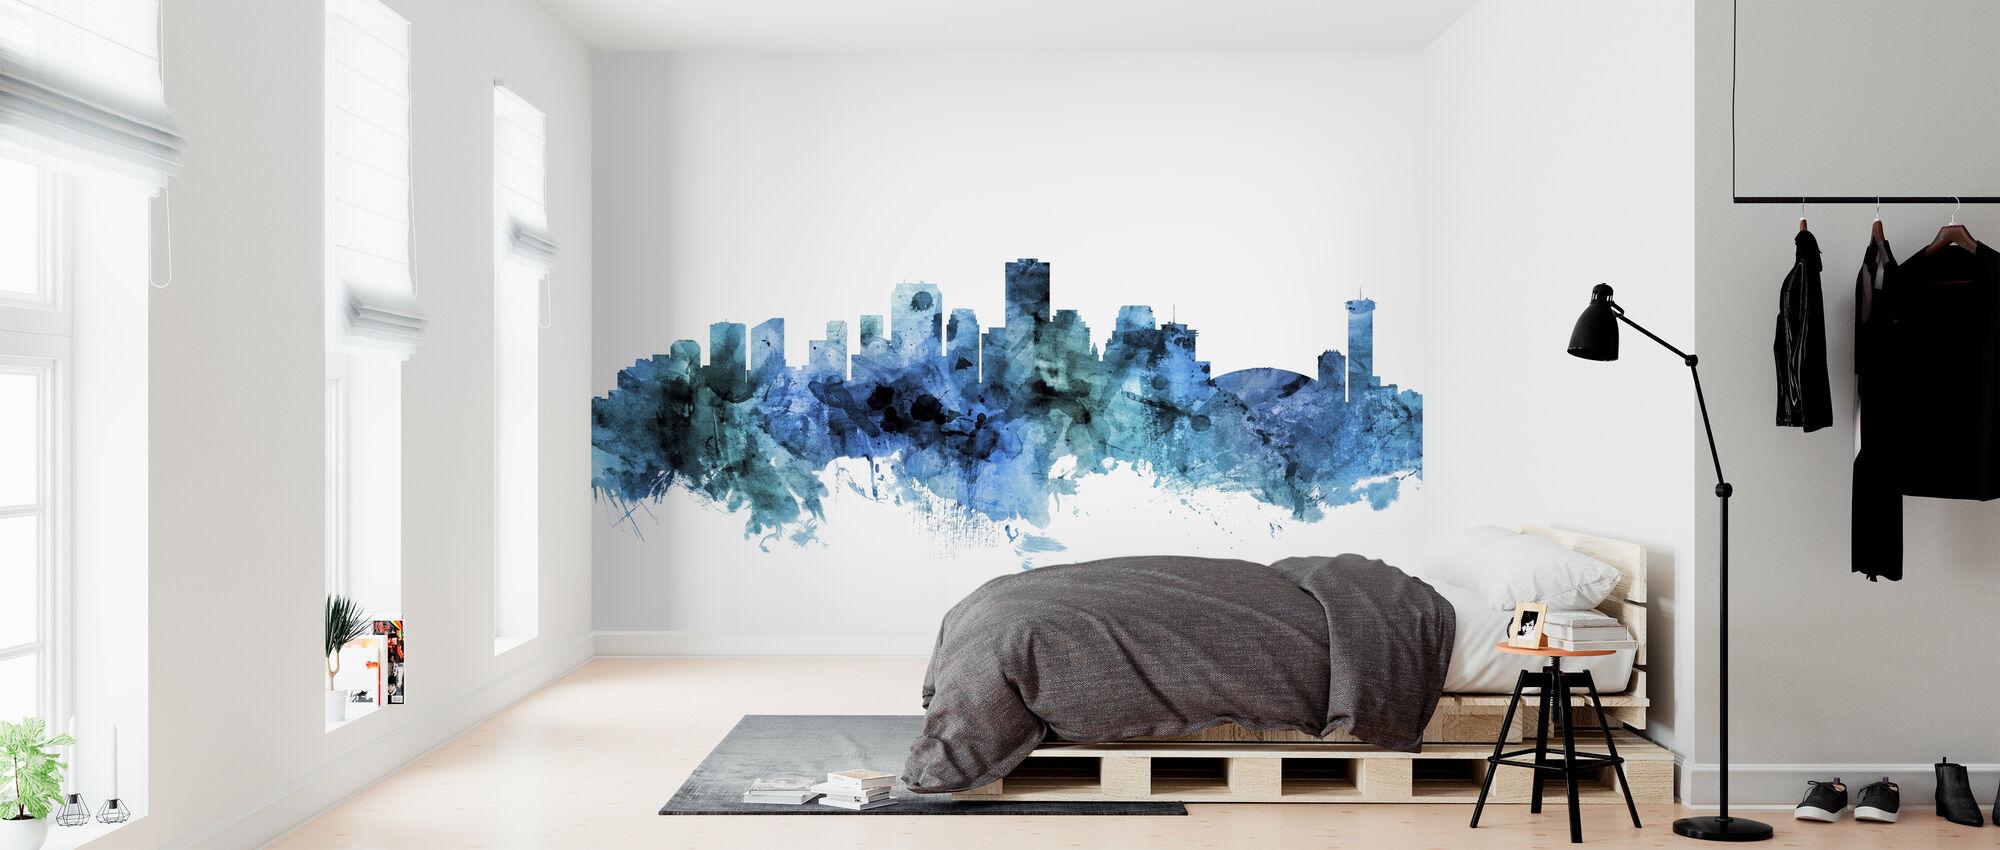 New Orleans Louisiana Skyline - Wallpaper - Bedroom